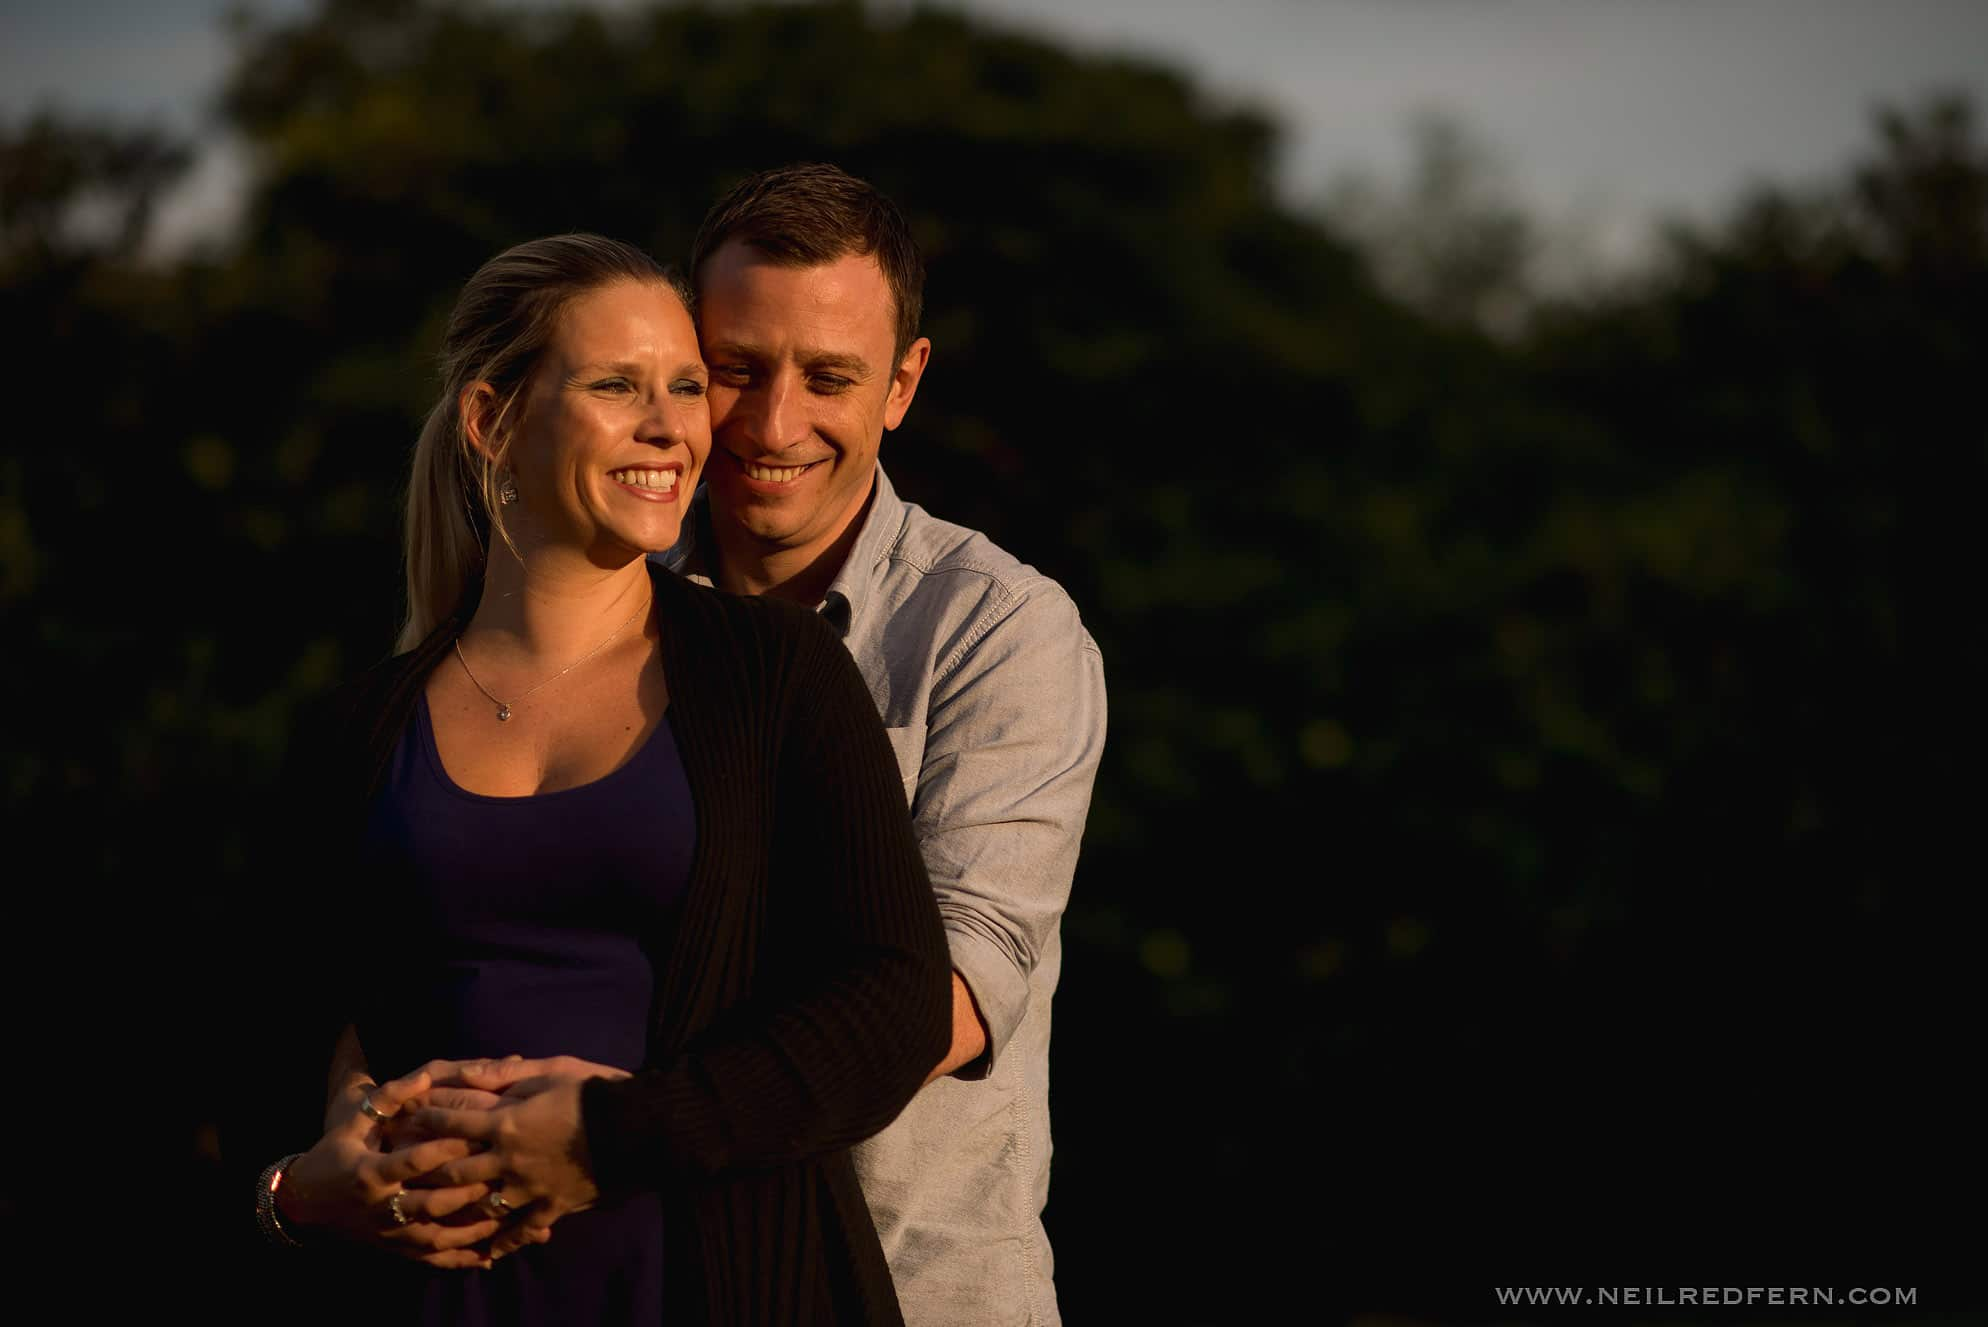 Cheshire engagement shoot - Gemma & Alex 03